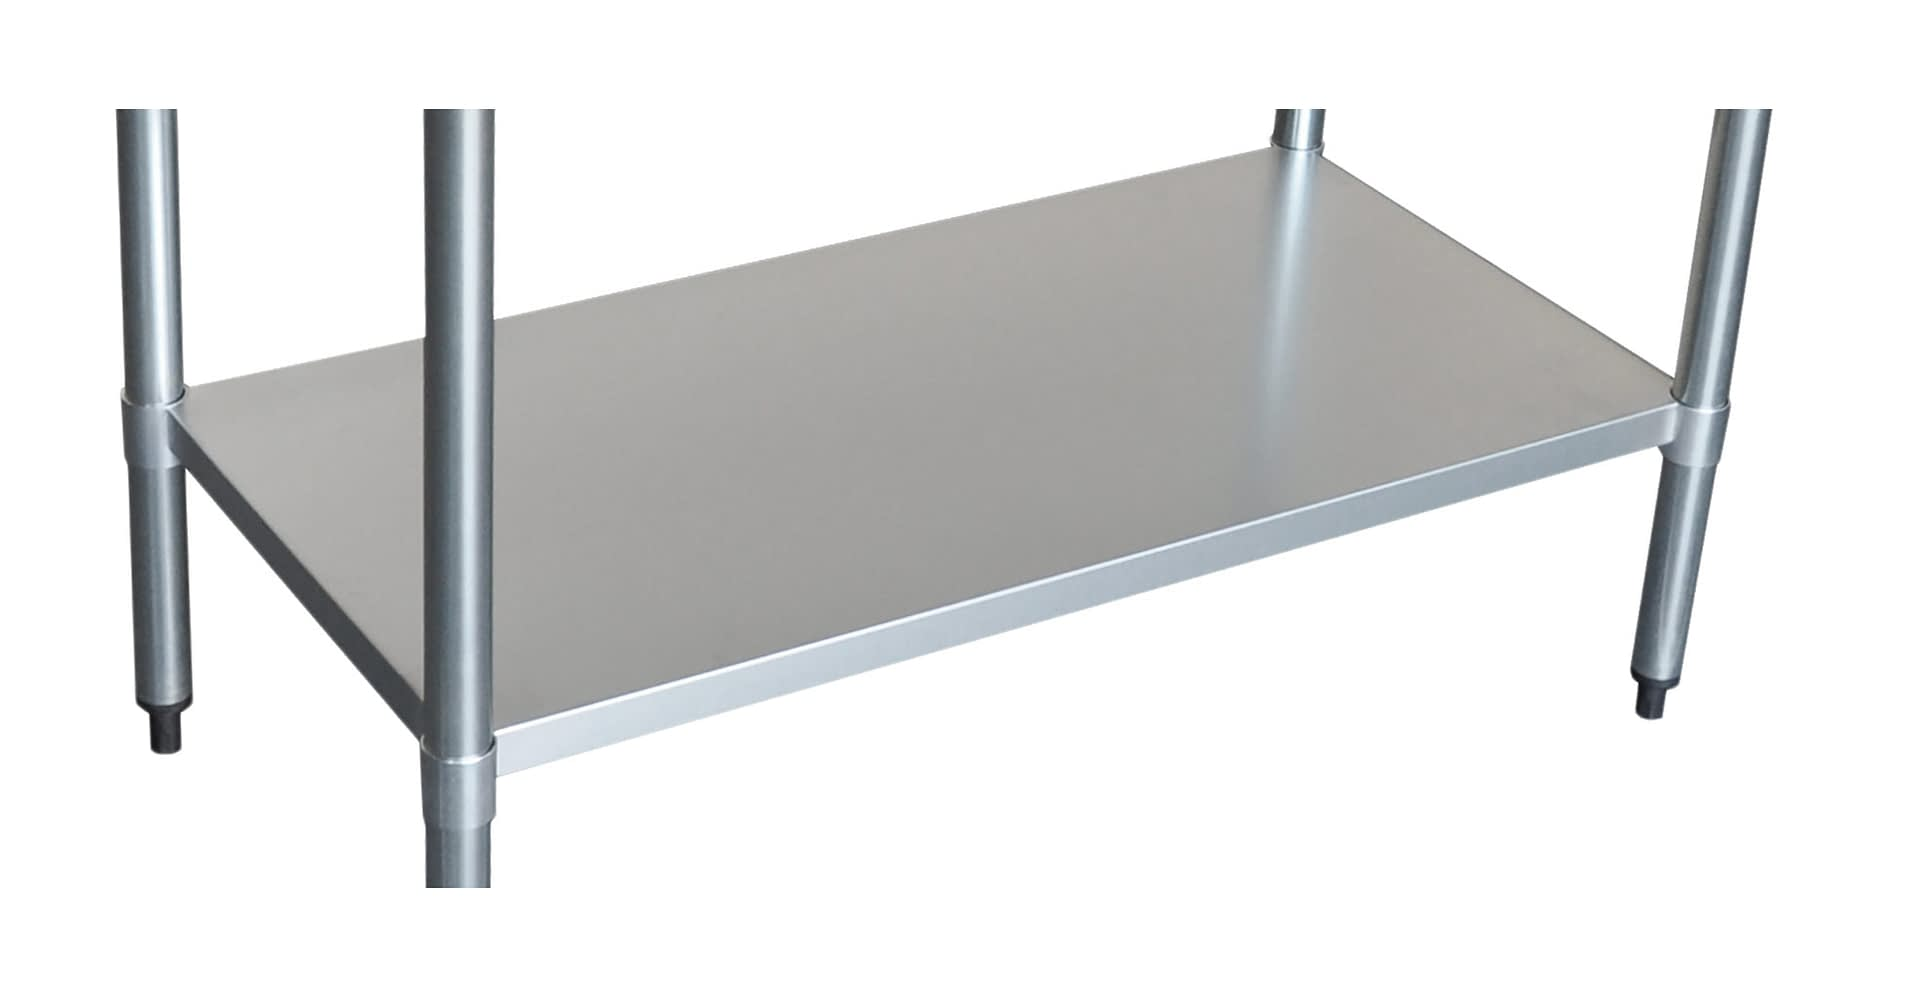 Stainless Undershelf for 3030 Bench